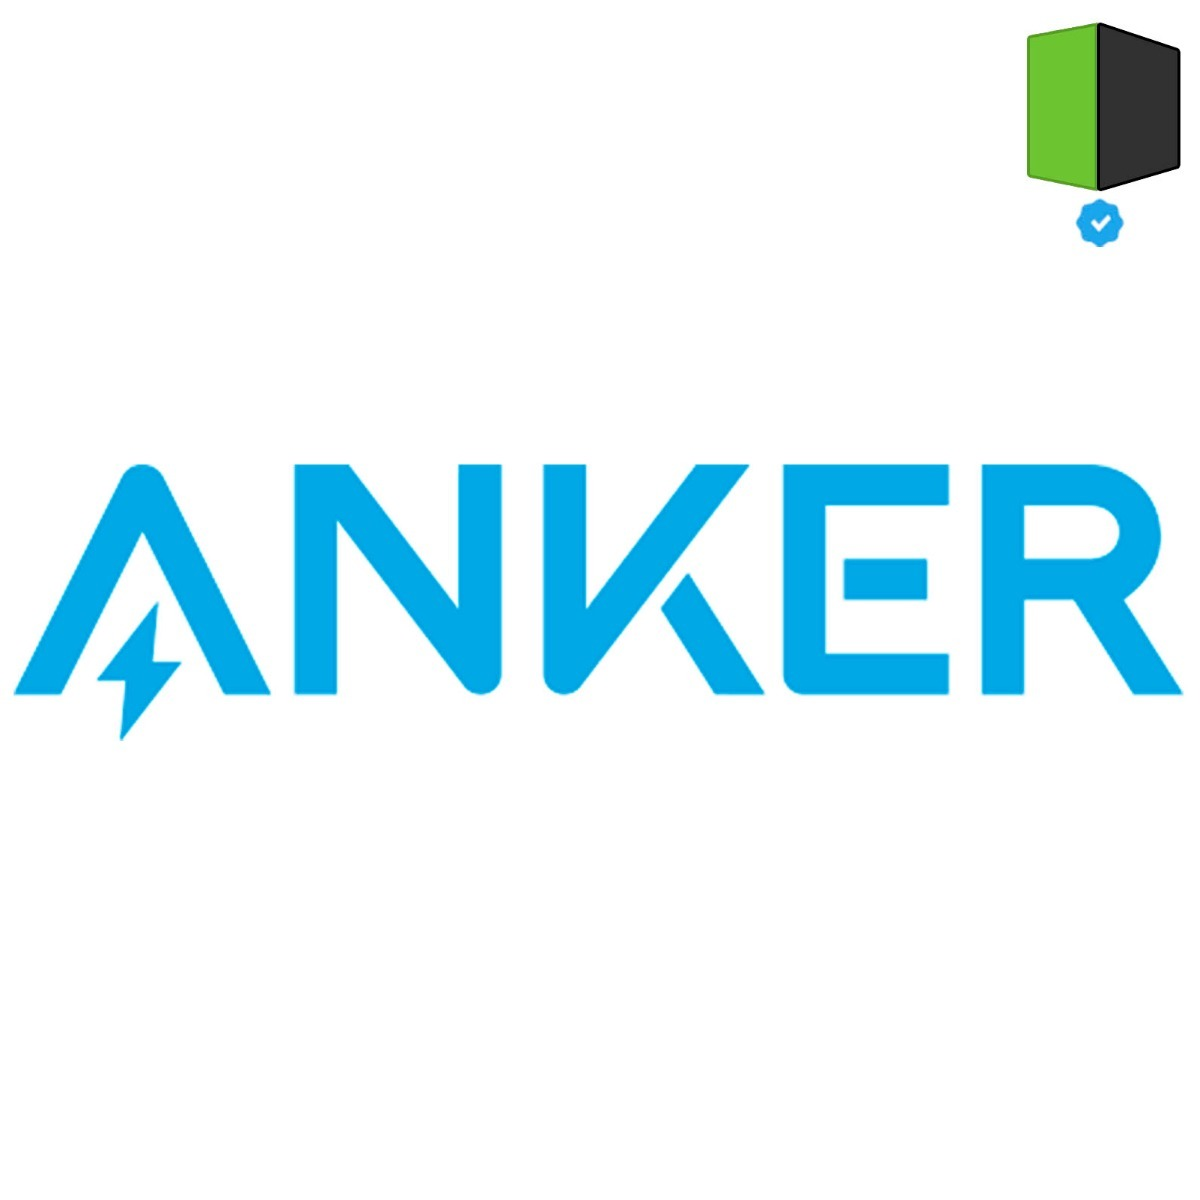 Bateria Portatil Anker Powercore 13400 Quick Charge Usb 30 Black A1316h11 Cargando Zoom